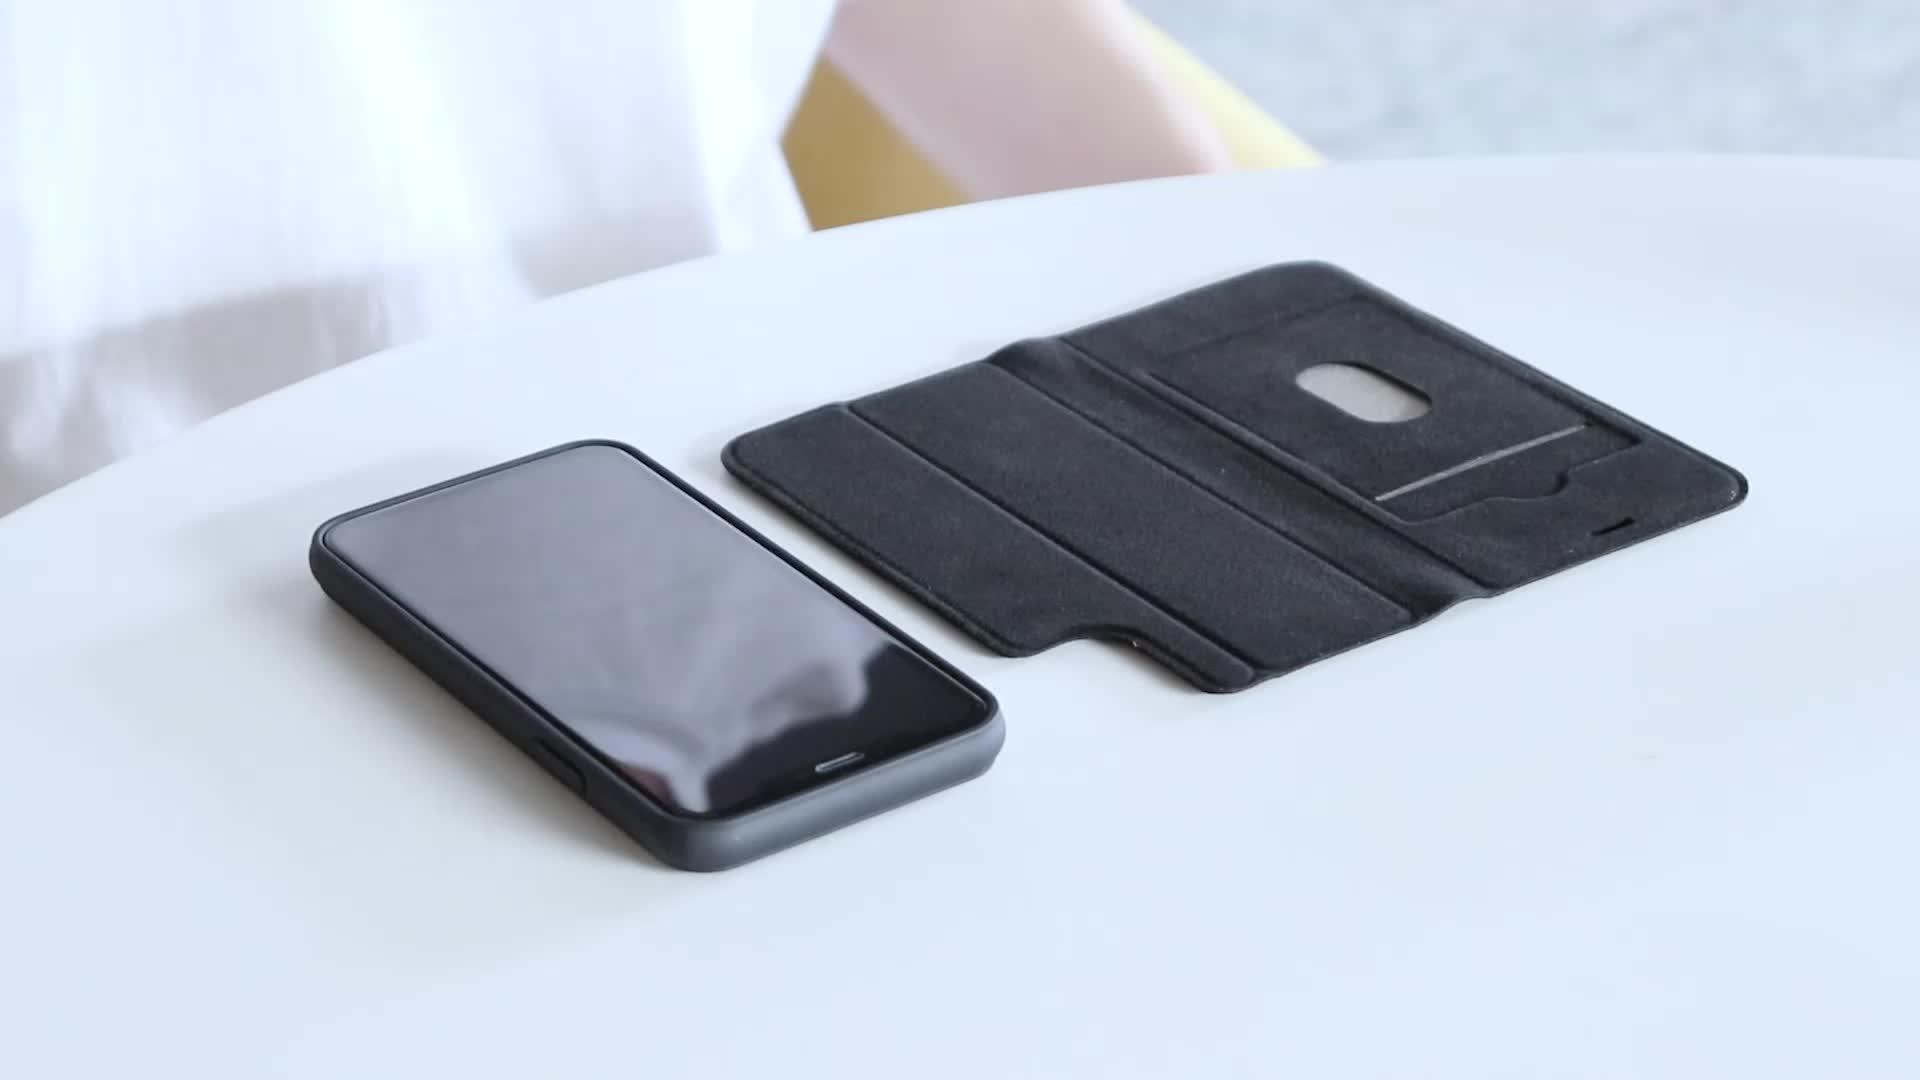 Laudtec Facebook Hot Sale Patent Detachable Leather Case for iPhone 11 Pro Max Small MOQ